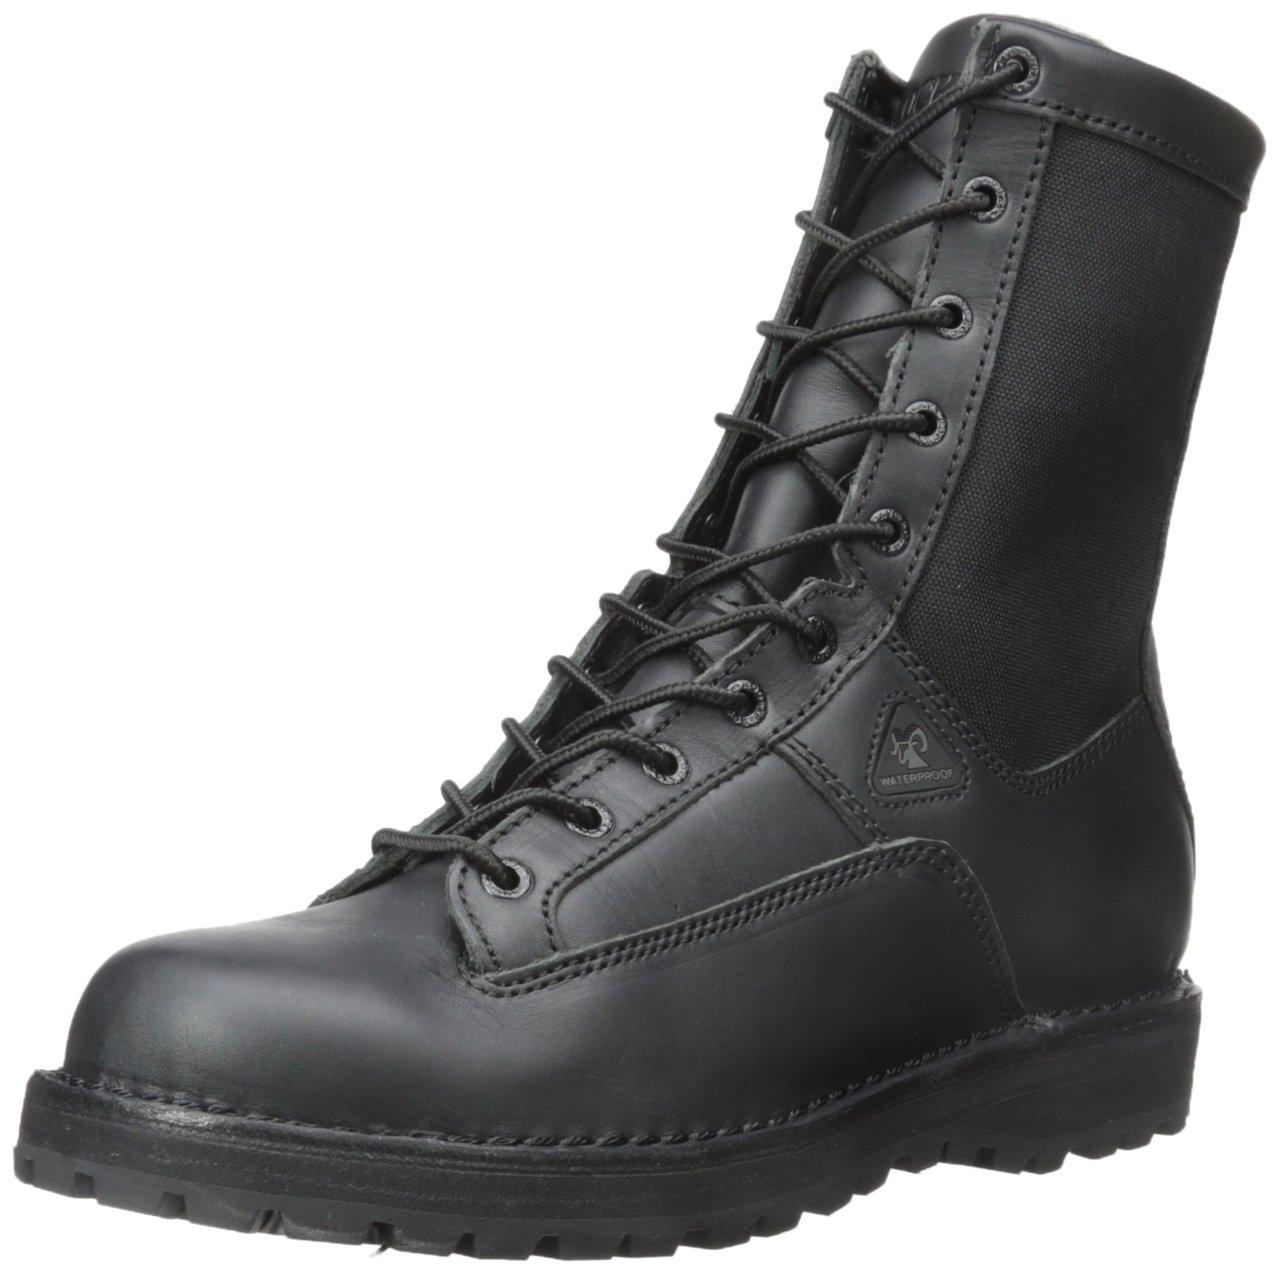 Rocky メンズ B000FI2KN2 13 D(M) US|ブラック ブラック 13 D(M) US